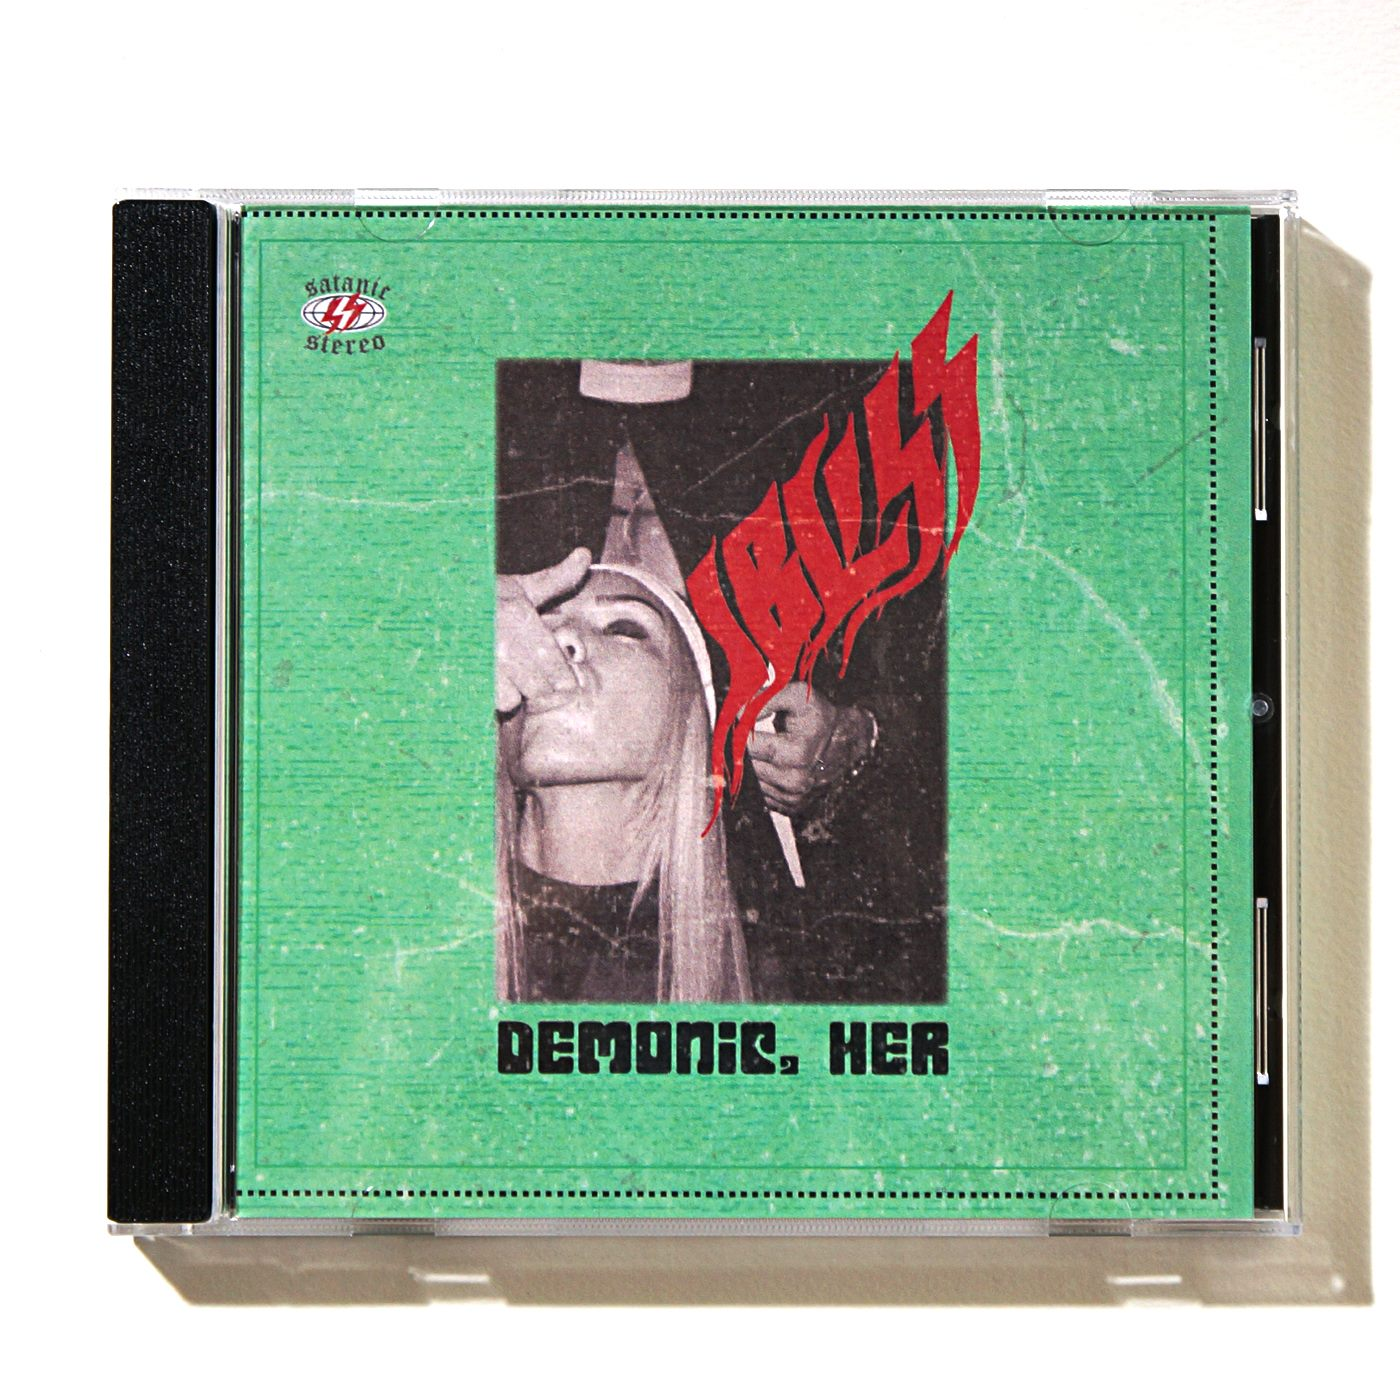 IBLISS - Demonic Her(CD Ltd)